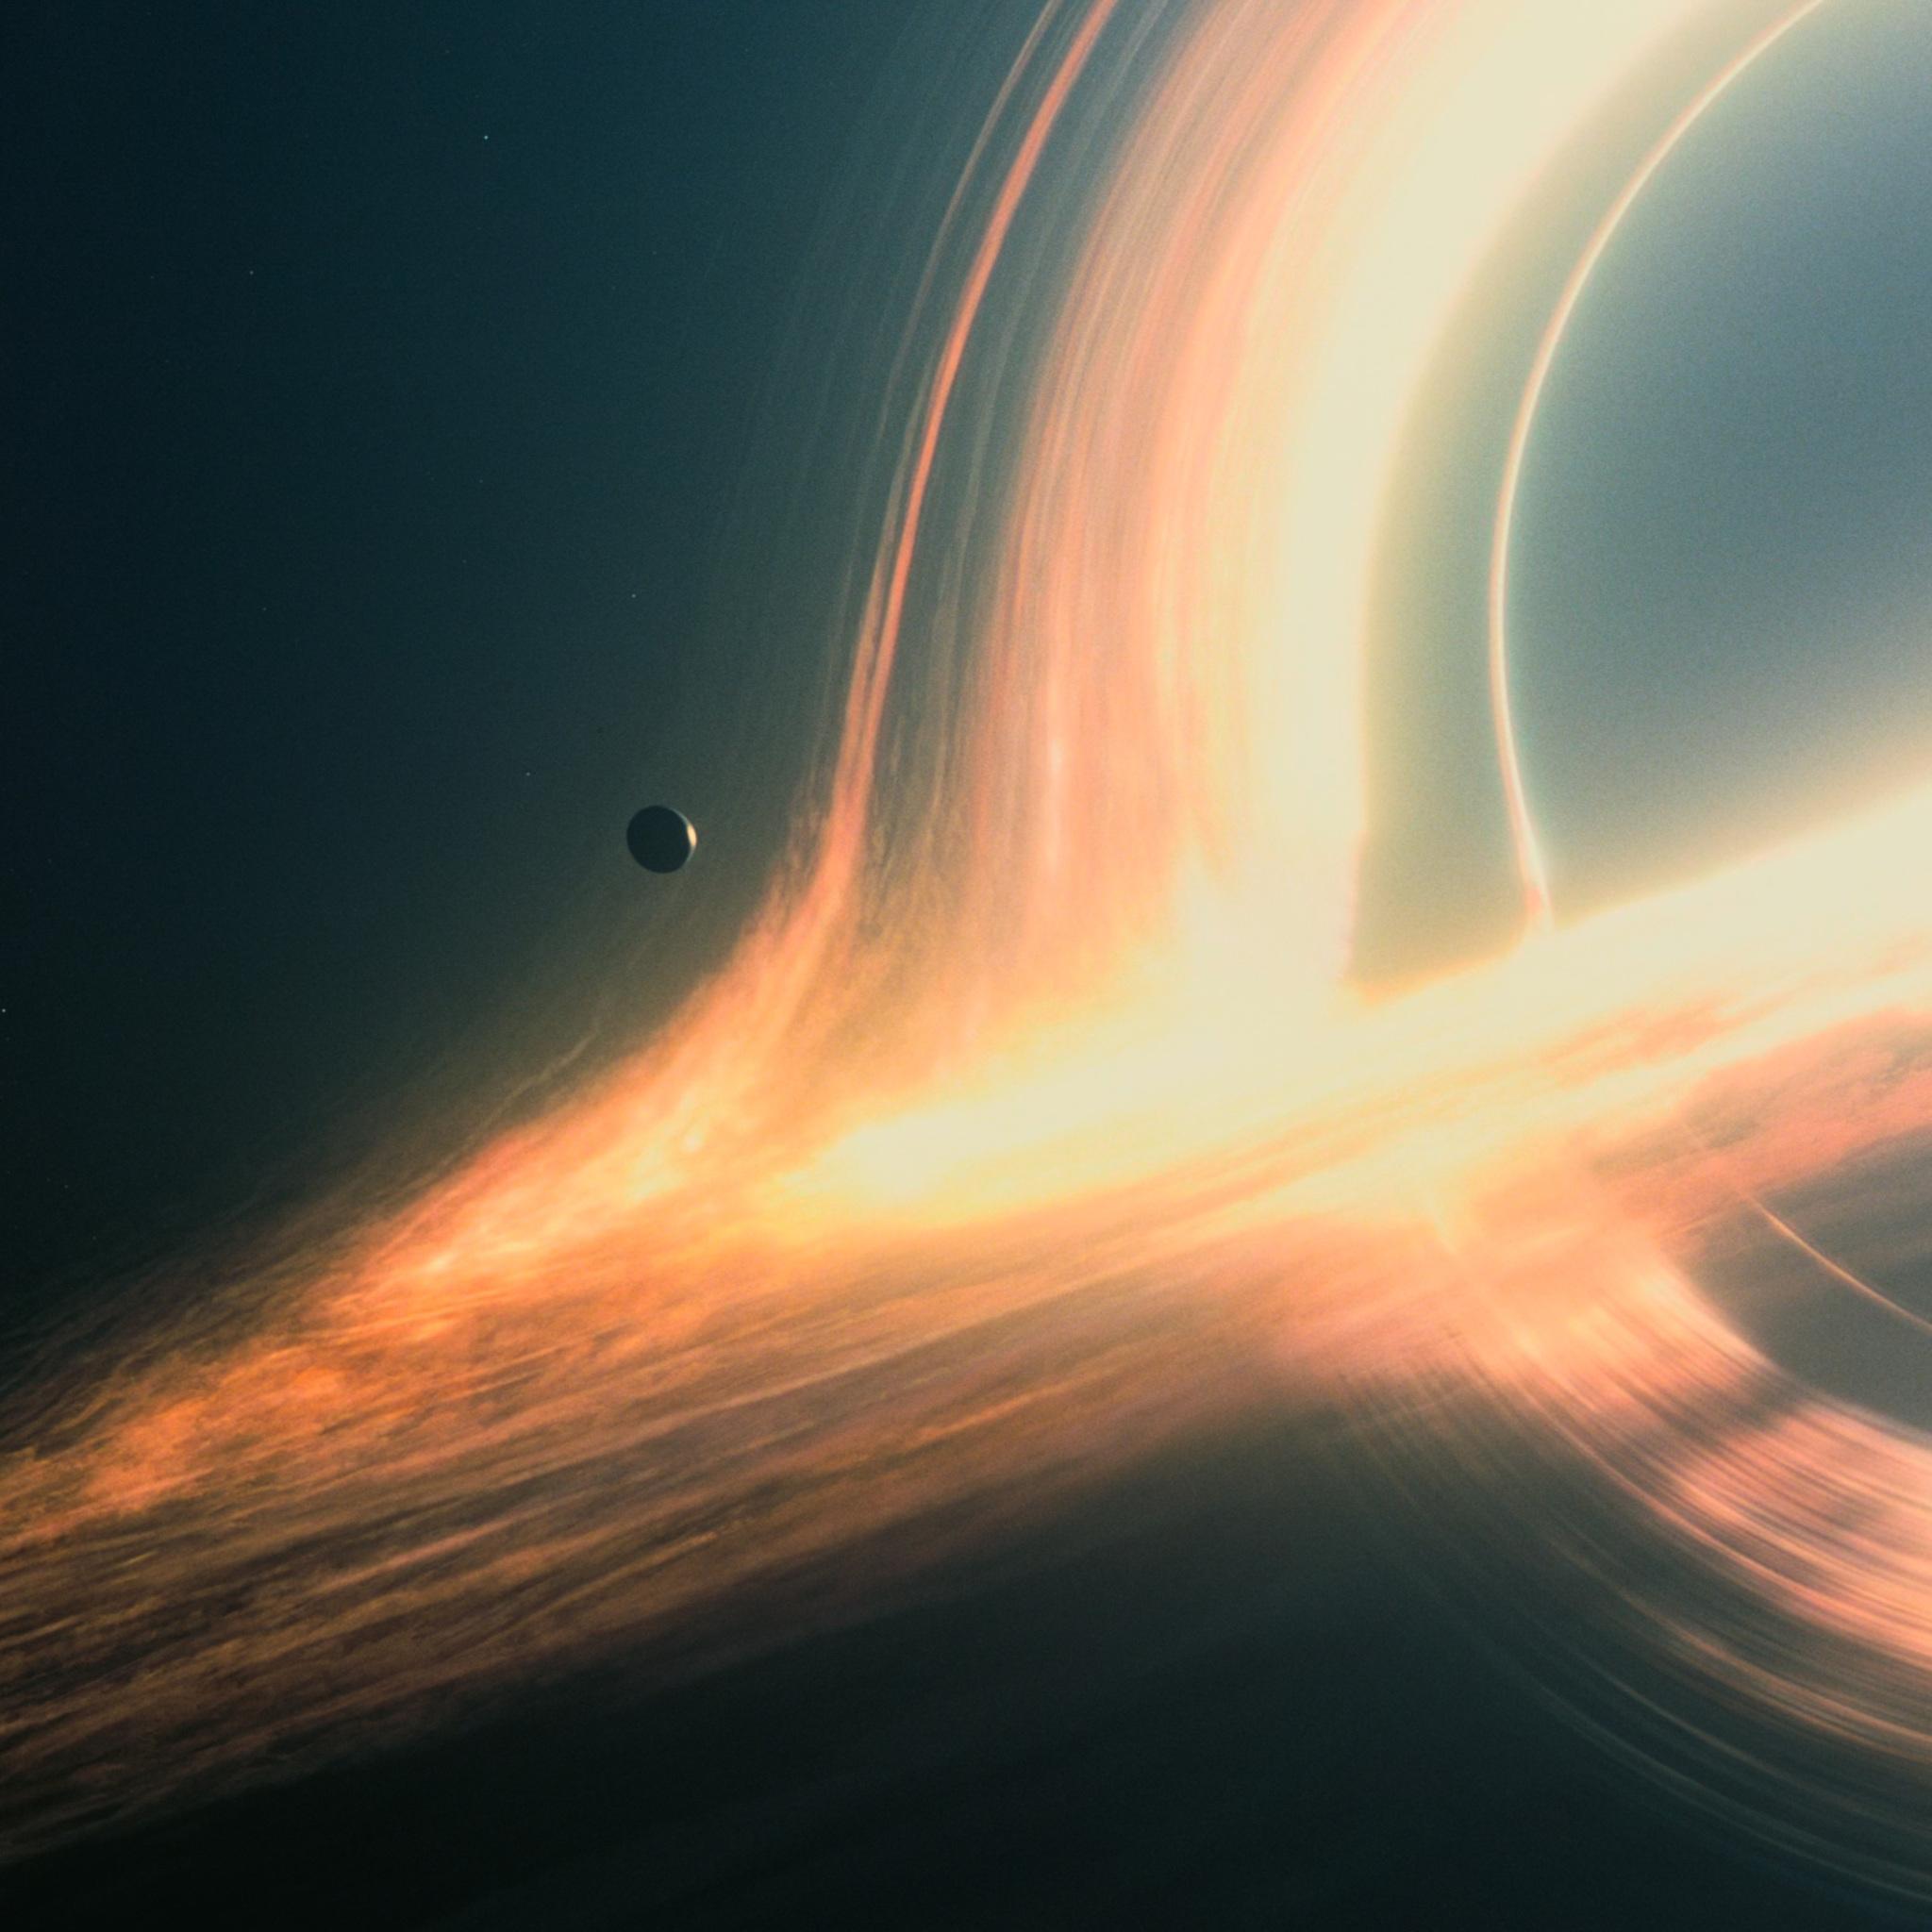 2048x2048 Interstellar Gargantua Ipad Air HD 4k Wallpapers ...